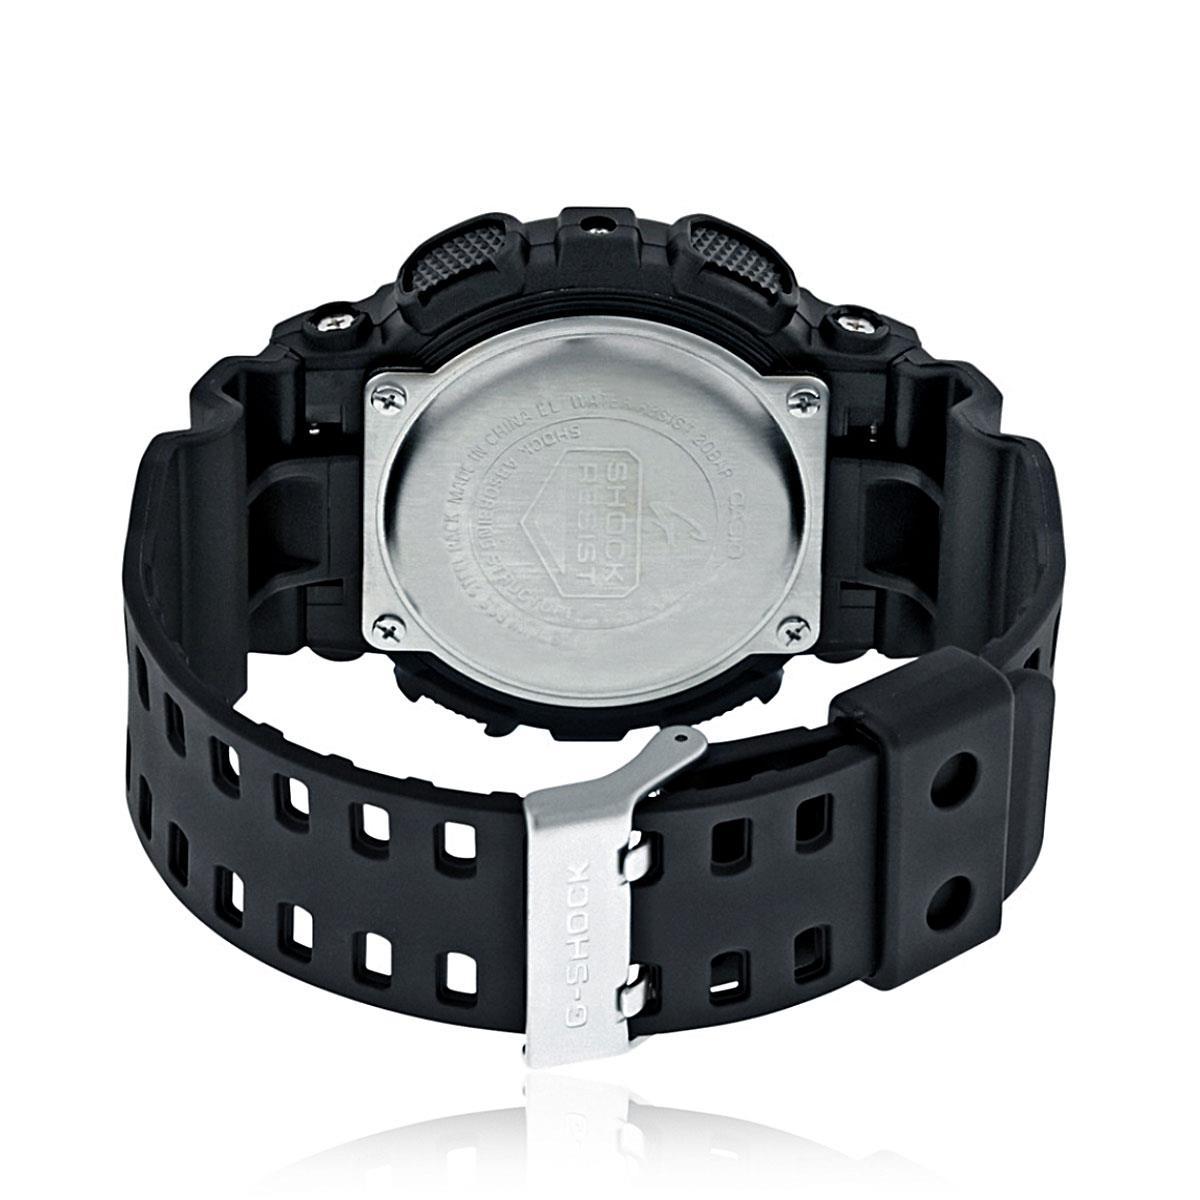 a12f8d1b54d Relógio Masculino Casio G-Shock Digital GD-120MB-1DR Preto